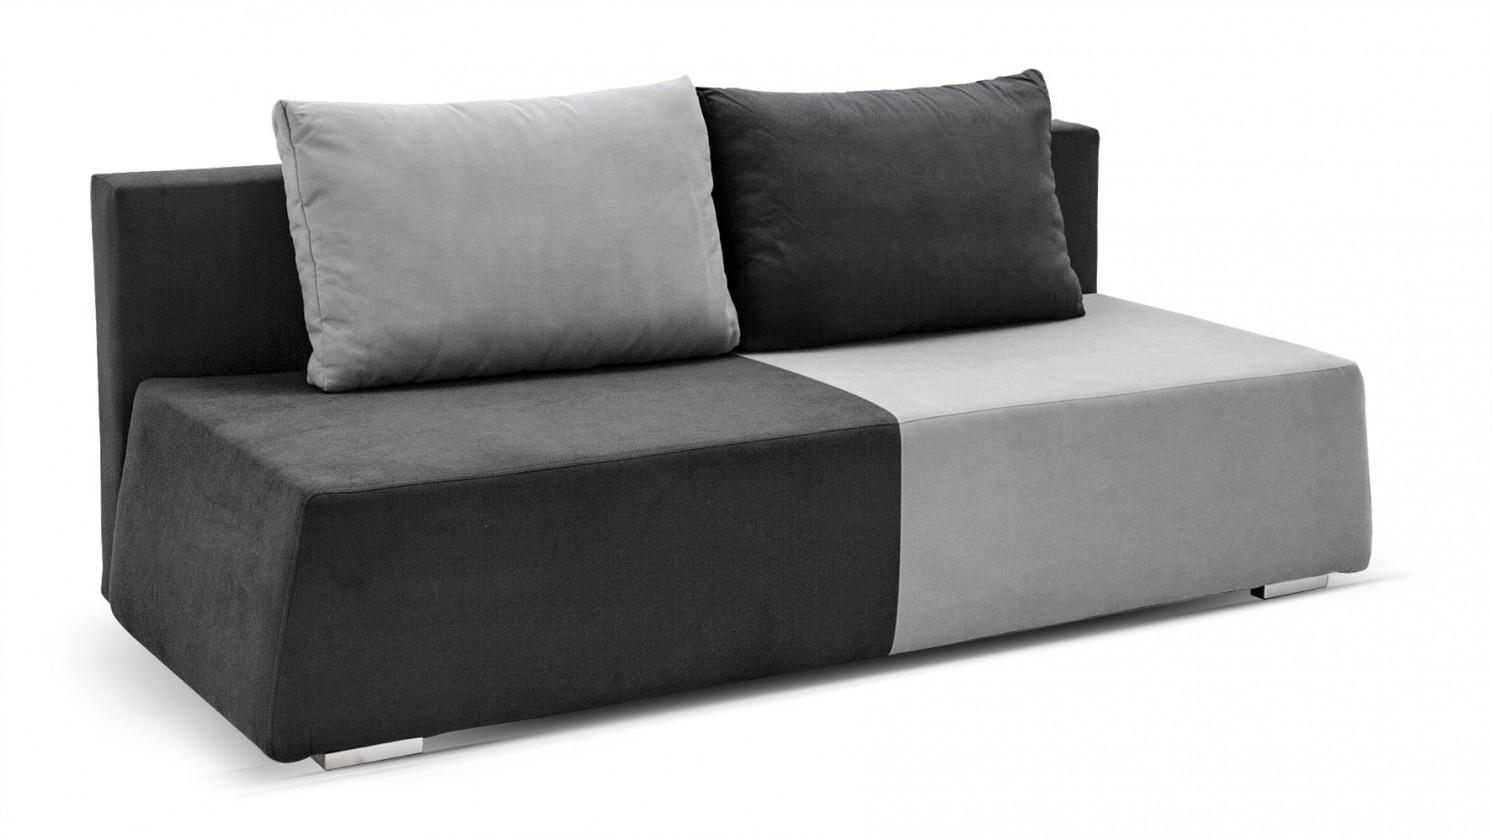 Pohovka Color - Pohovka, rozkládací, úložný prostor (šedá)